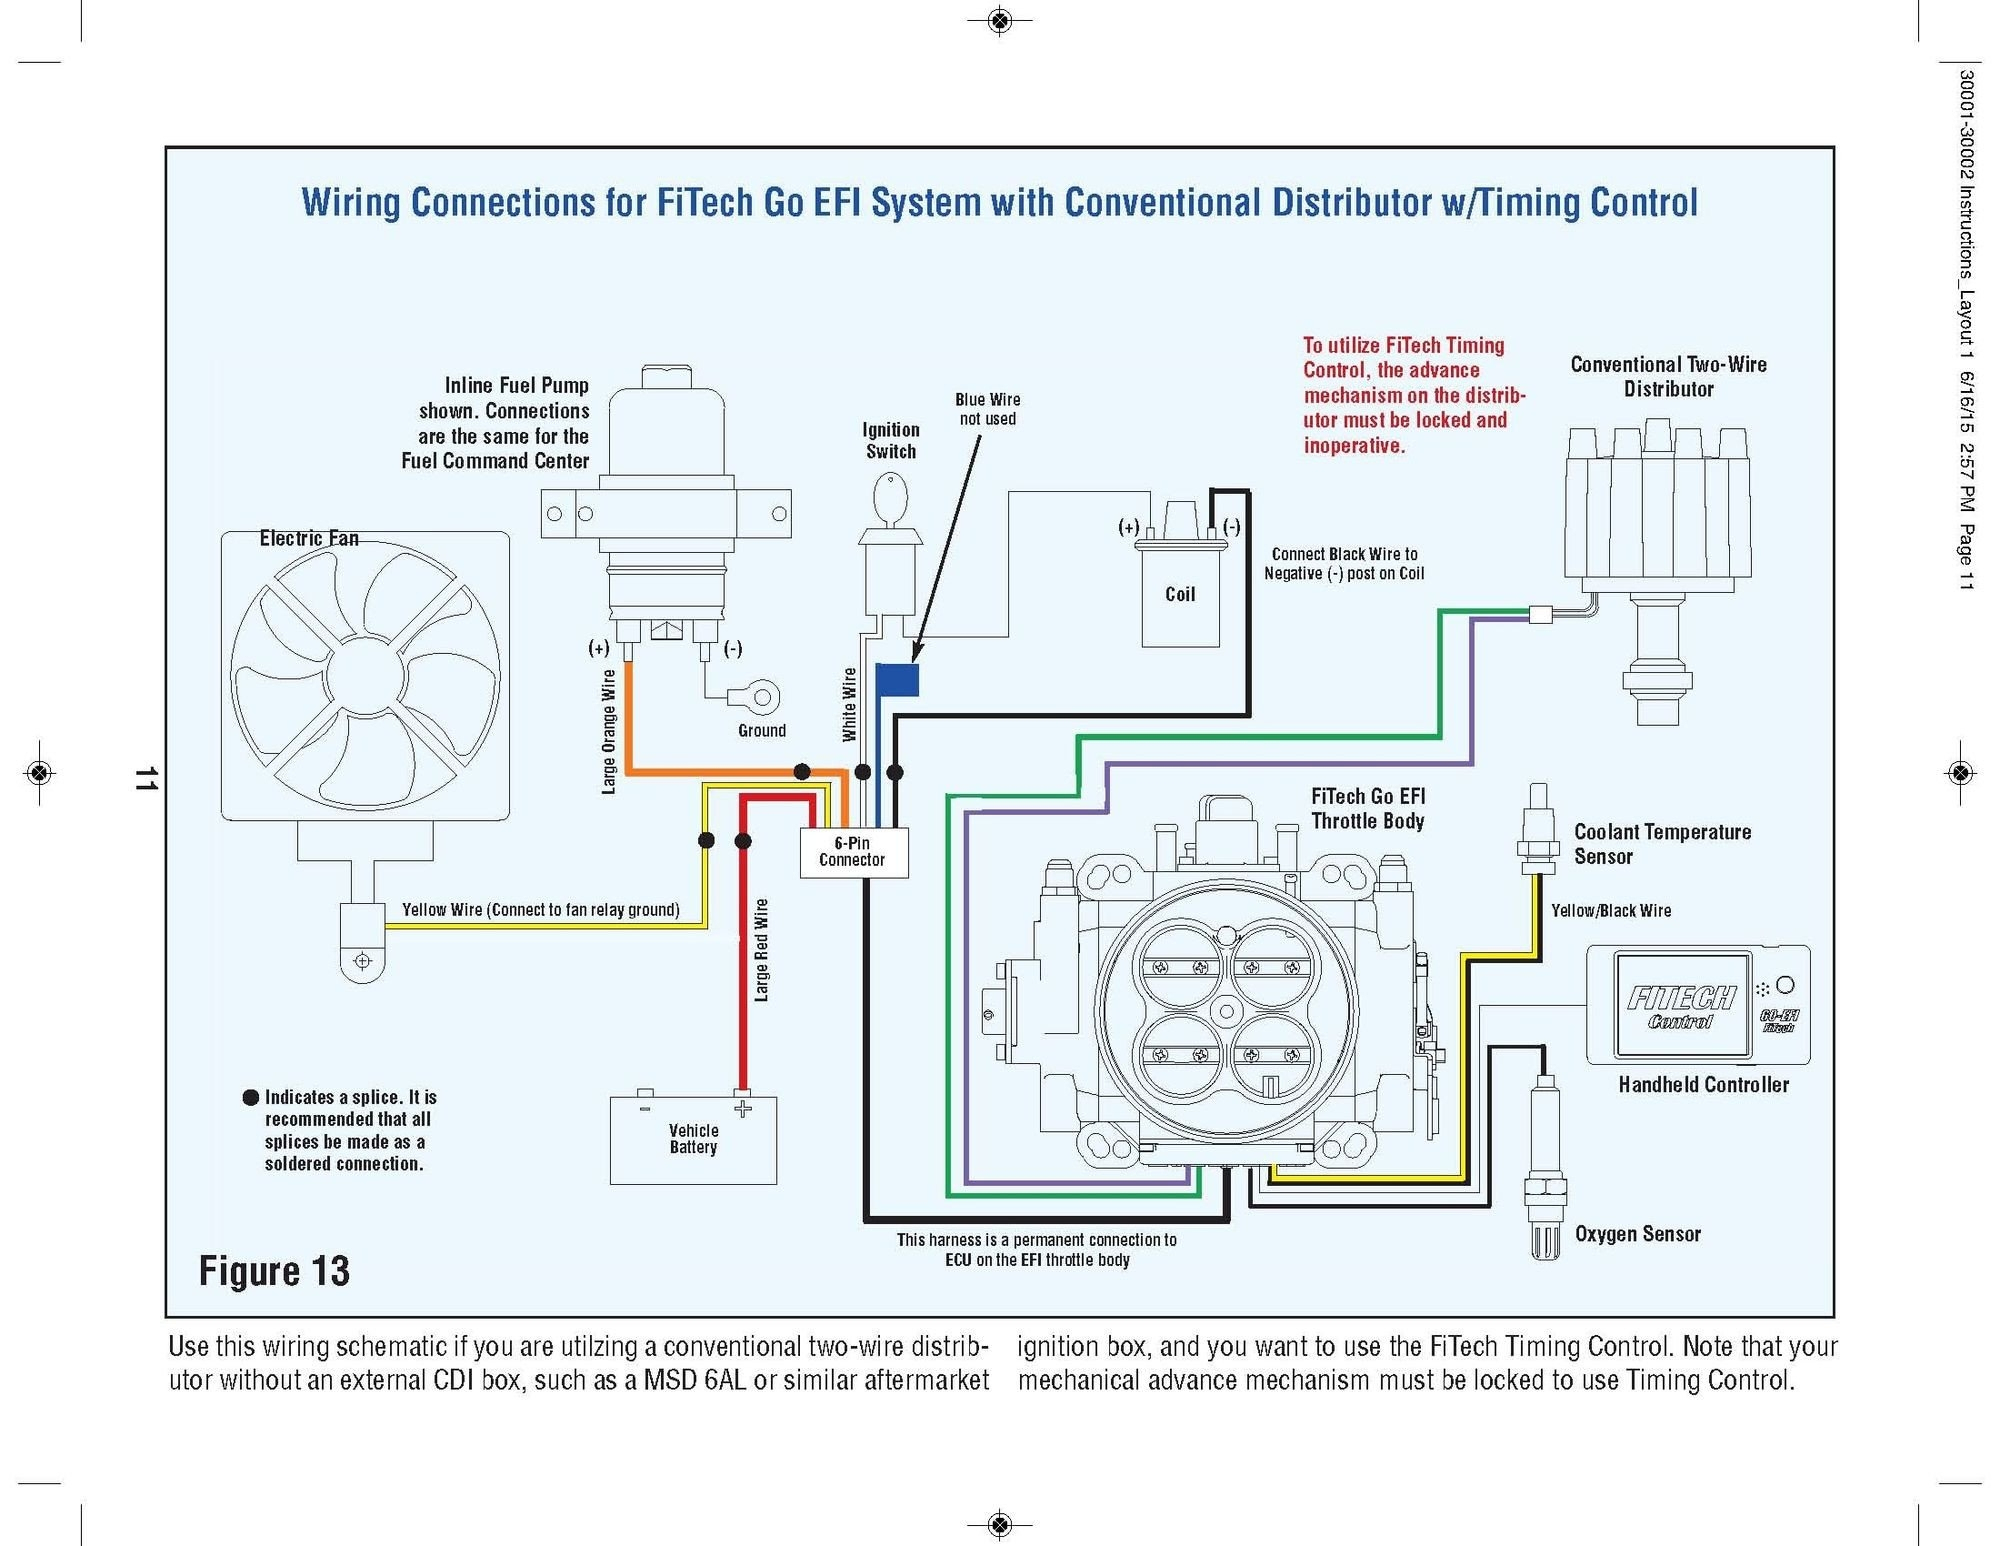 Groovy Fitech Wiring Diagram Wirings Diagram Wiring Digital Resources Bocepslowmaporg